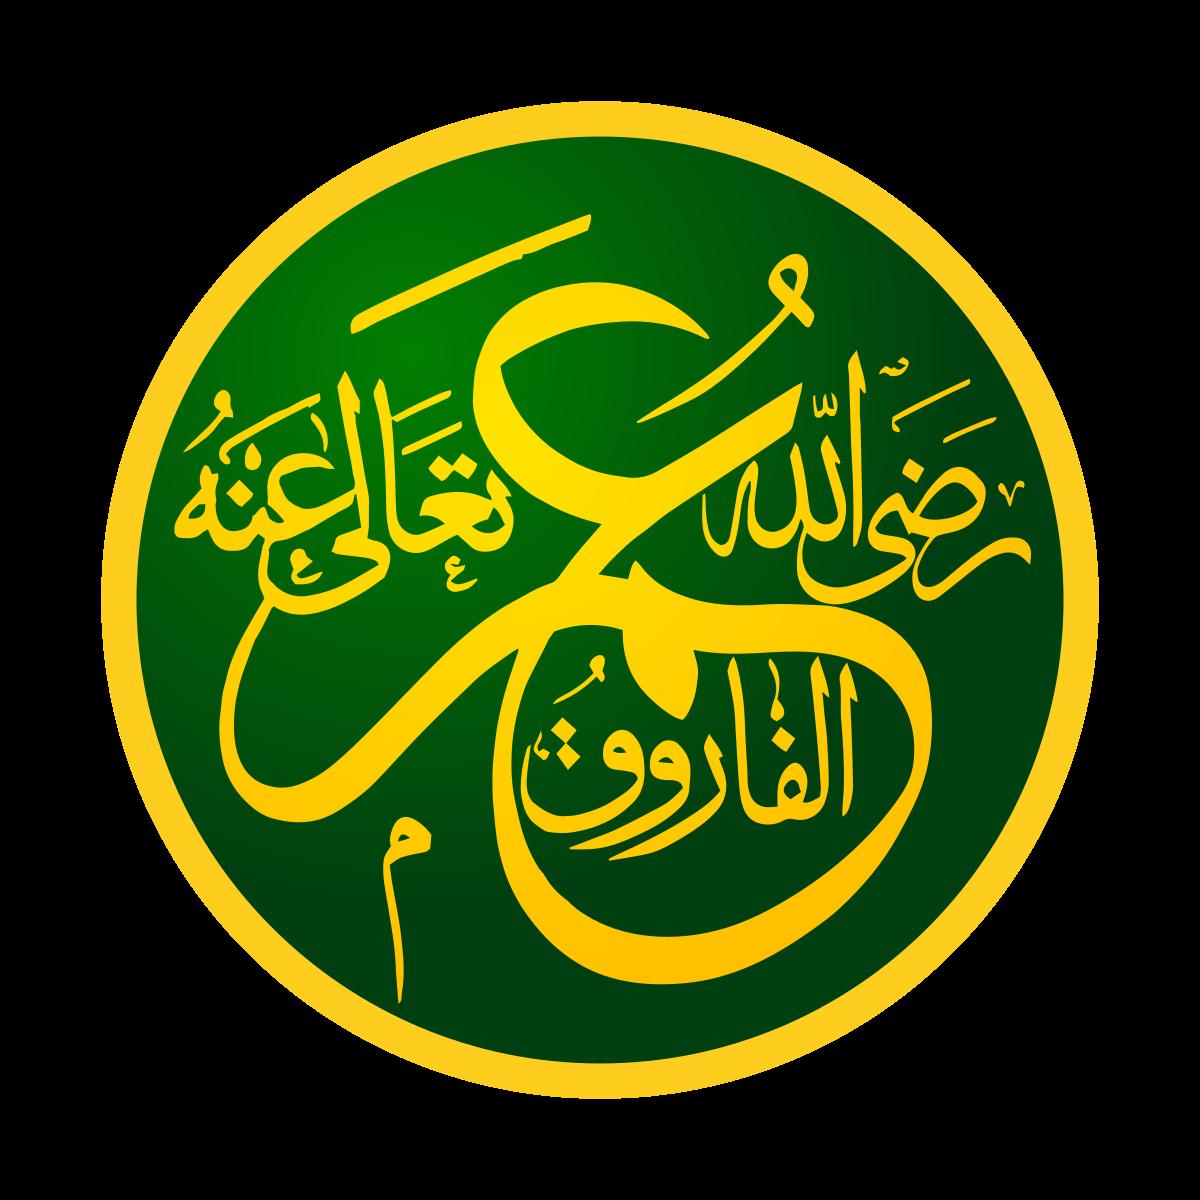 Le calife Omar ibn al Khattab